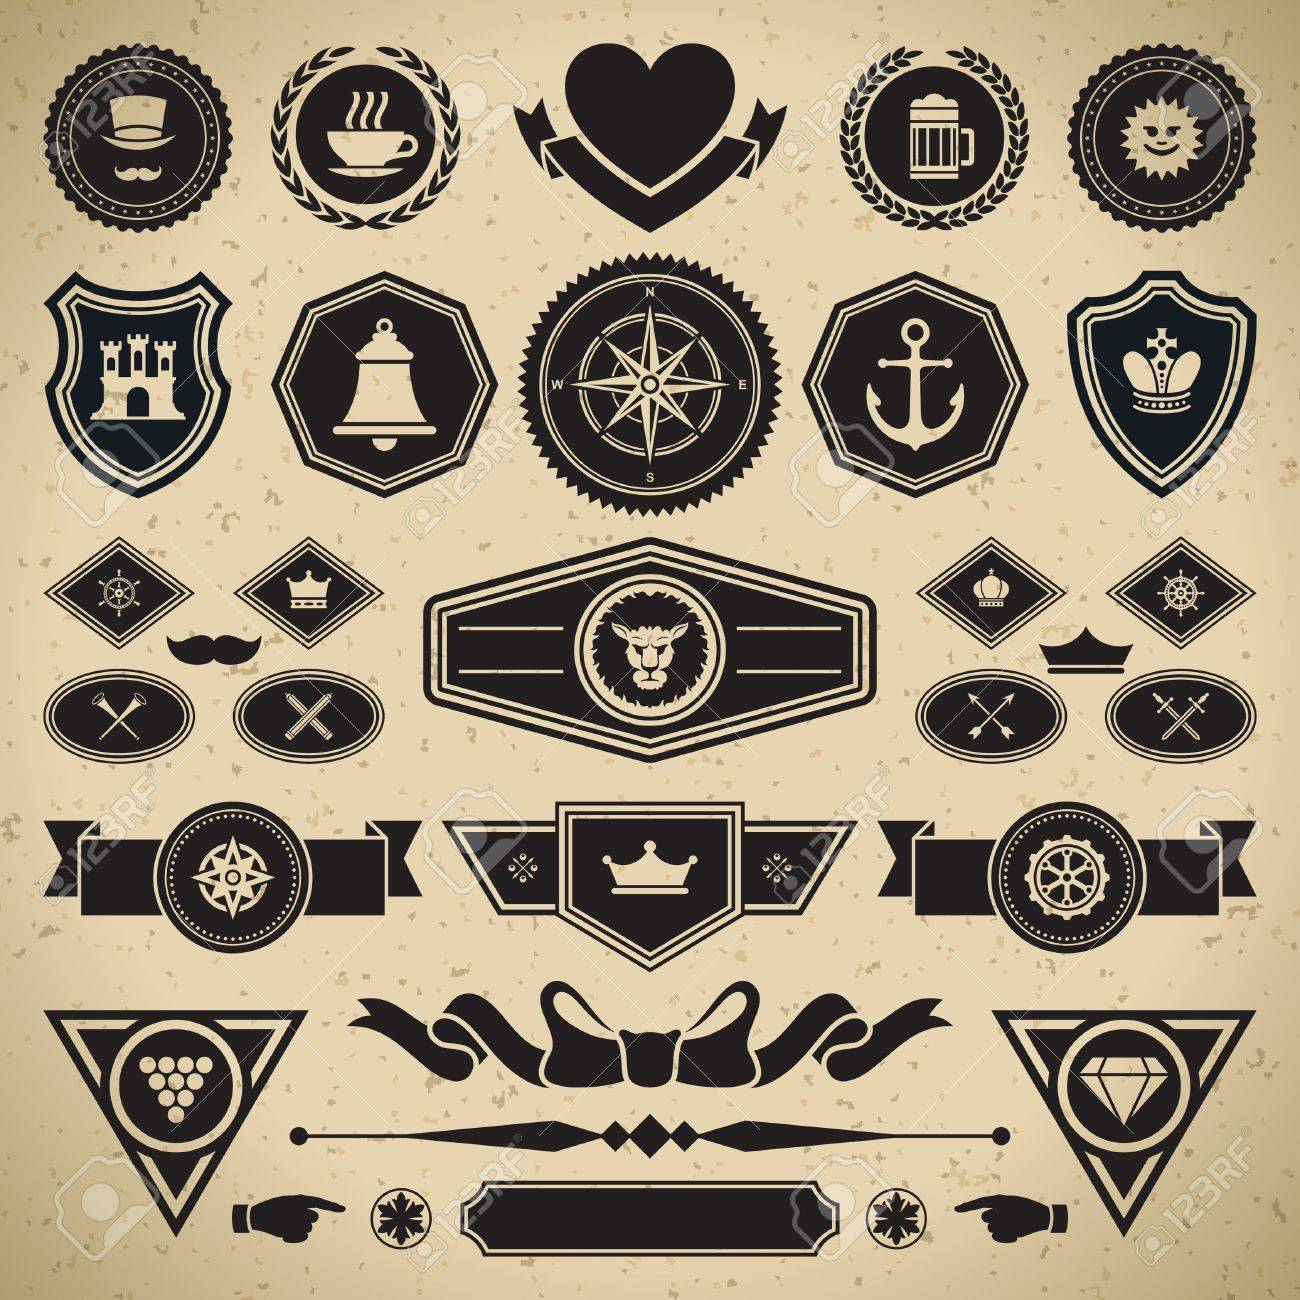 Vintage style retro emblem label collection vector design elements Stock Vector - 13014396